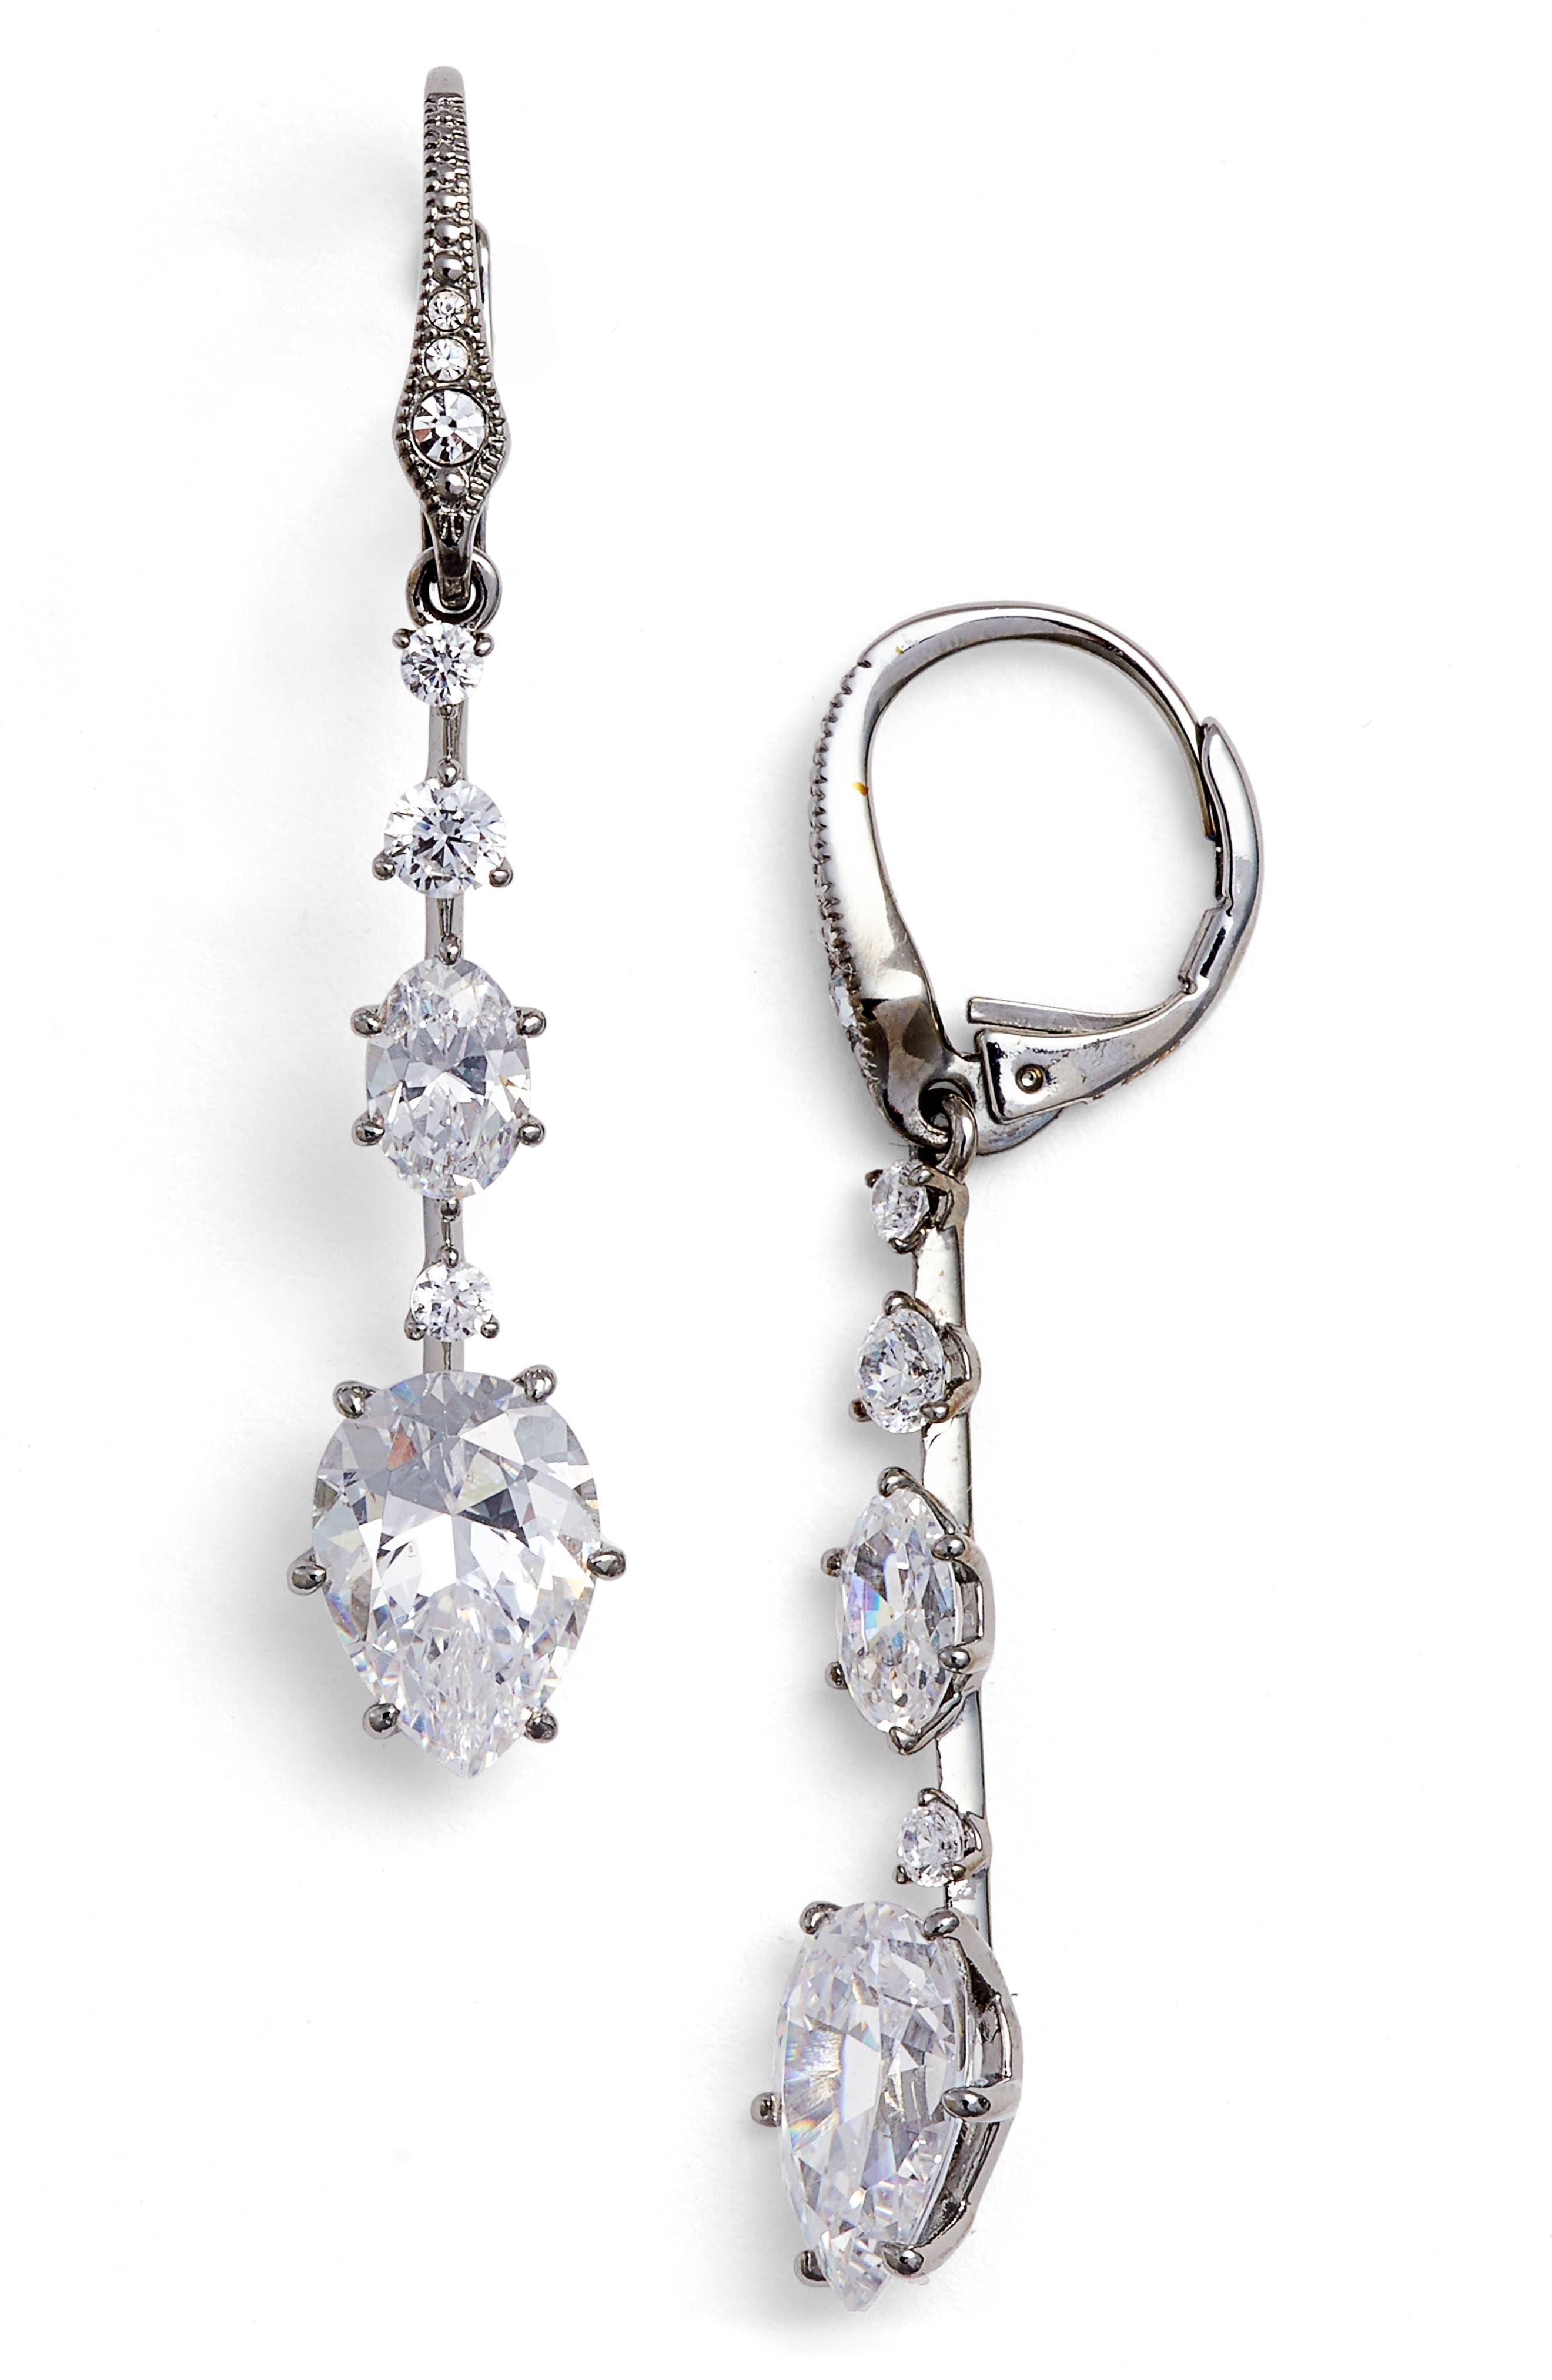 Royale Cubic Zirconia Drop Earrings,                         Main,                         color, 001